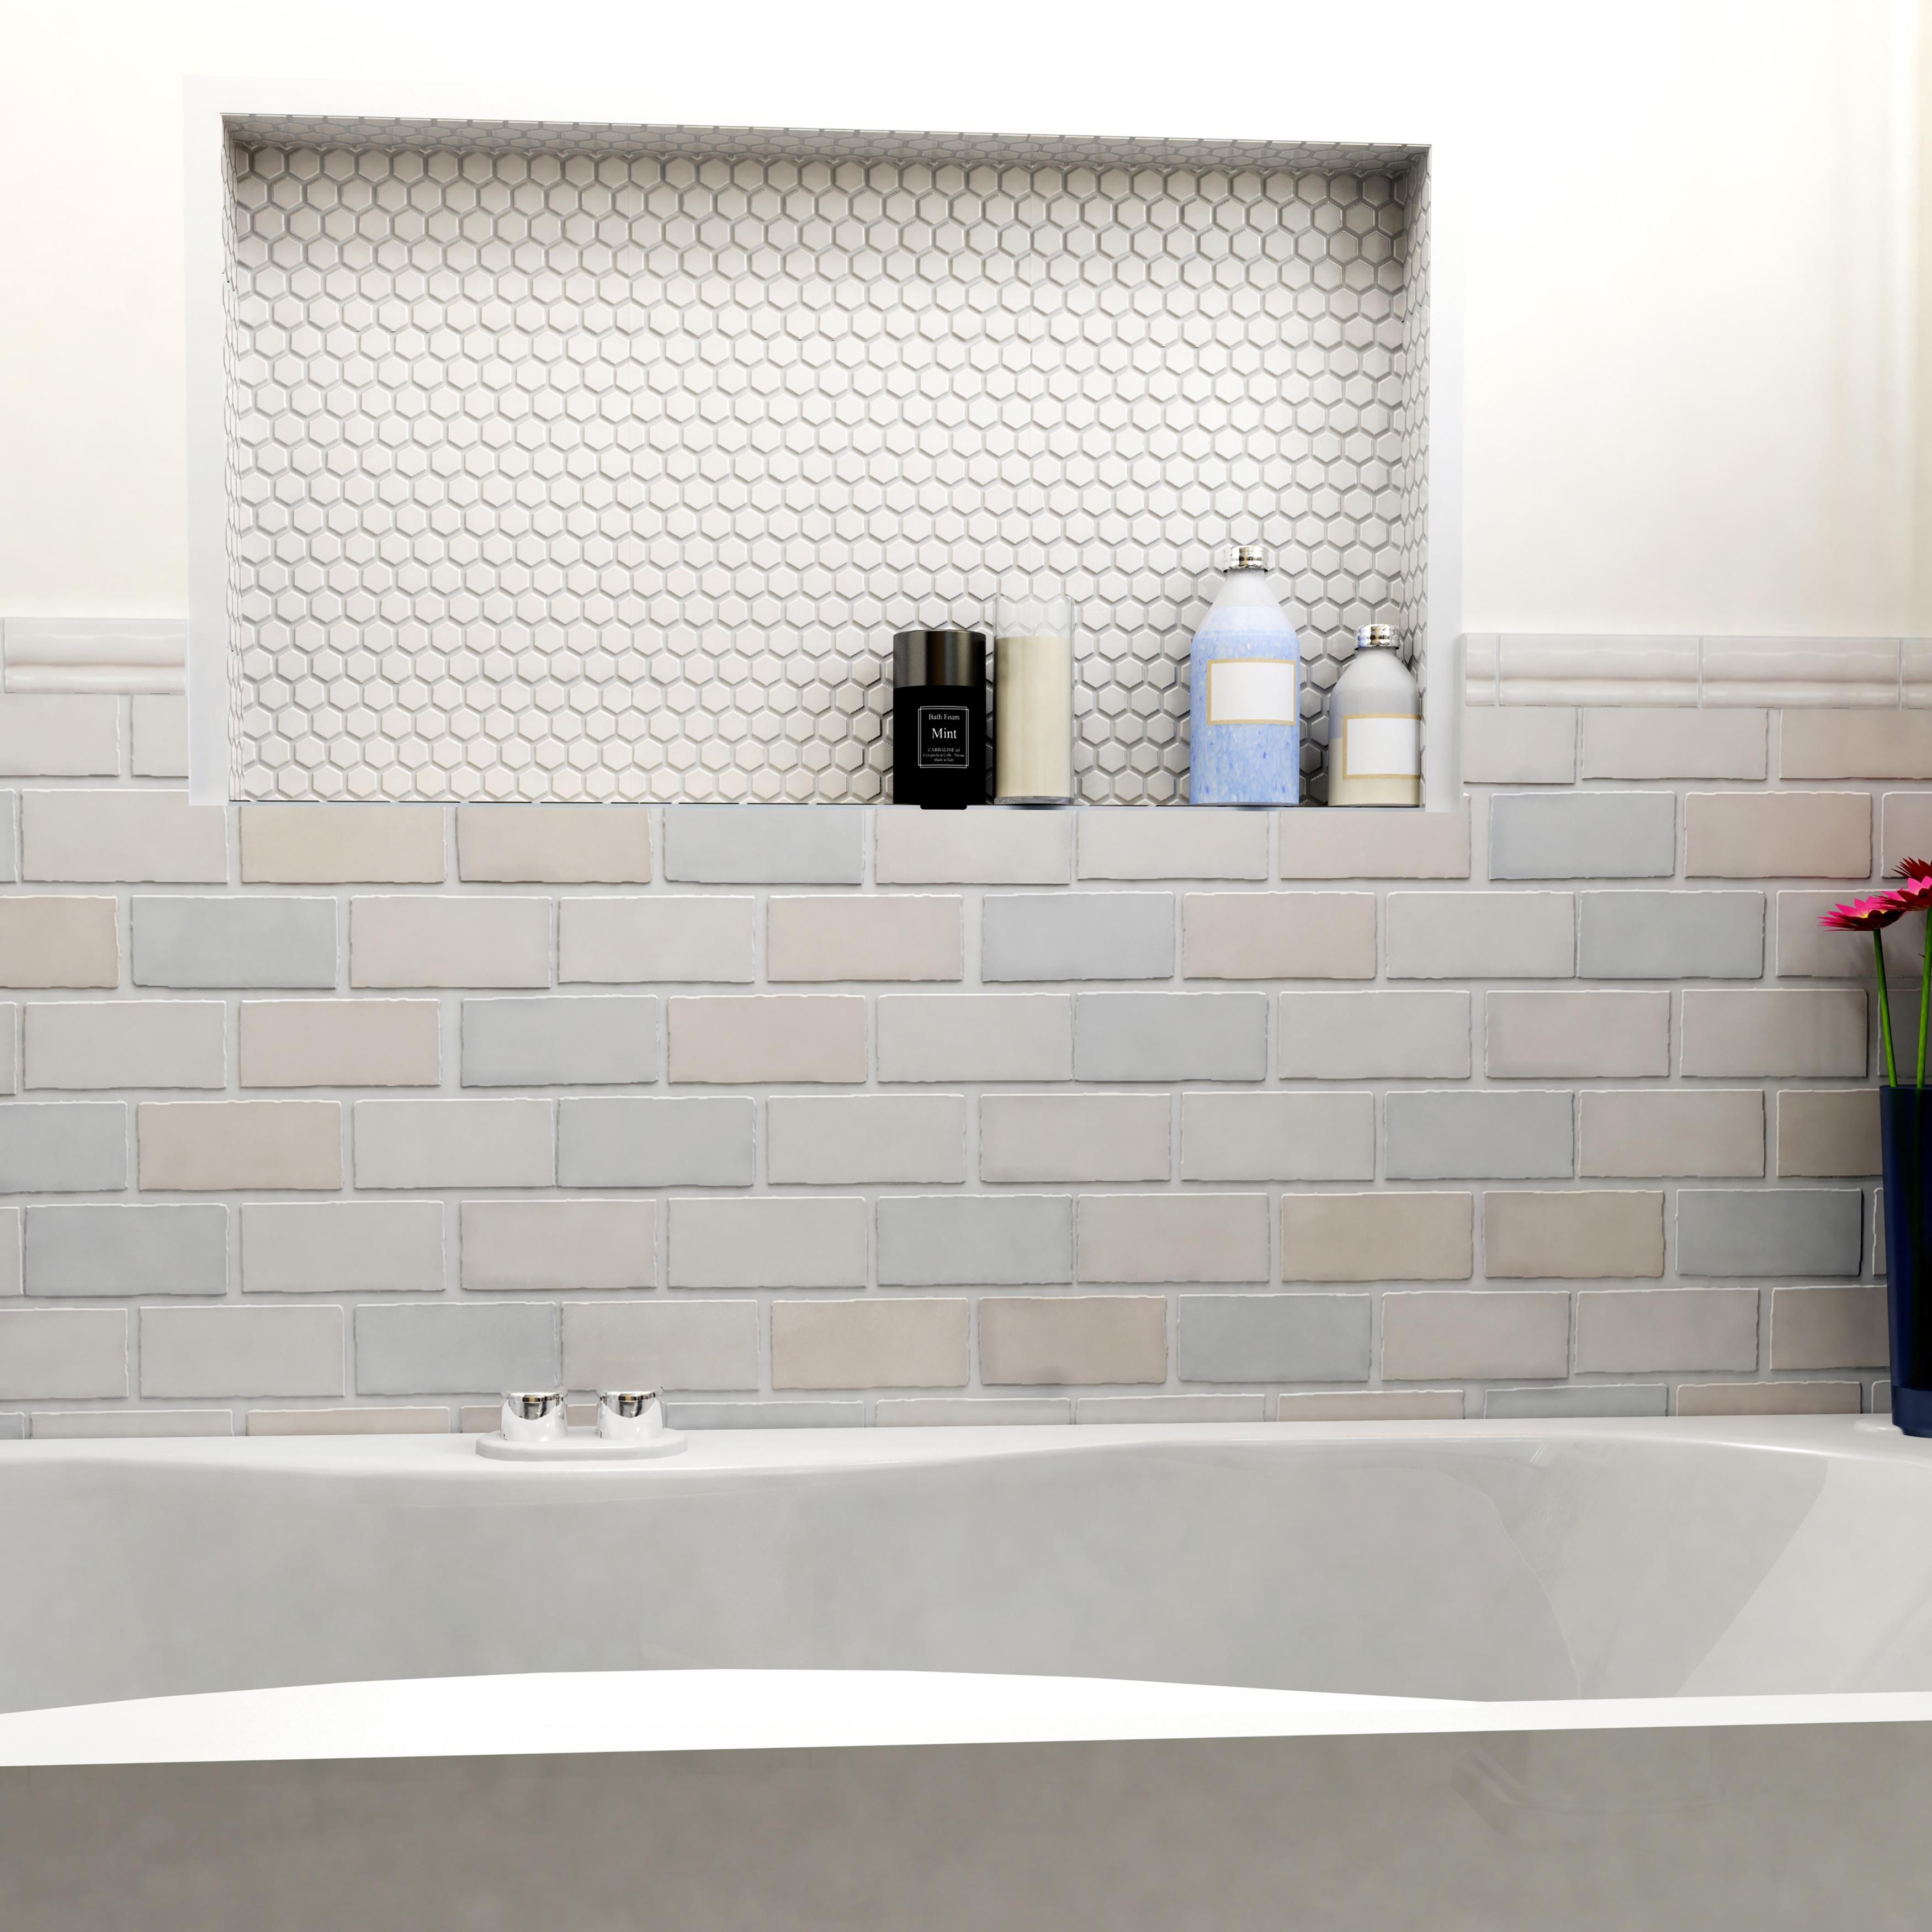 SomerTile 2.875x5.875-inch Artic Craquelle Mix Ceramic Wall Tile (32 ...